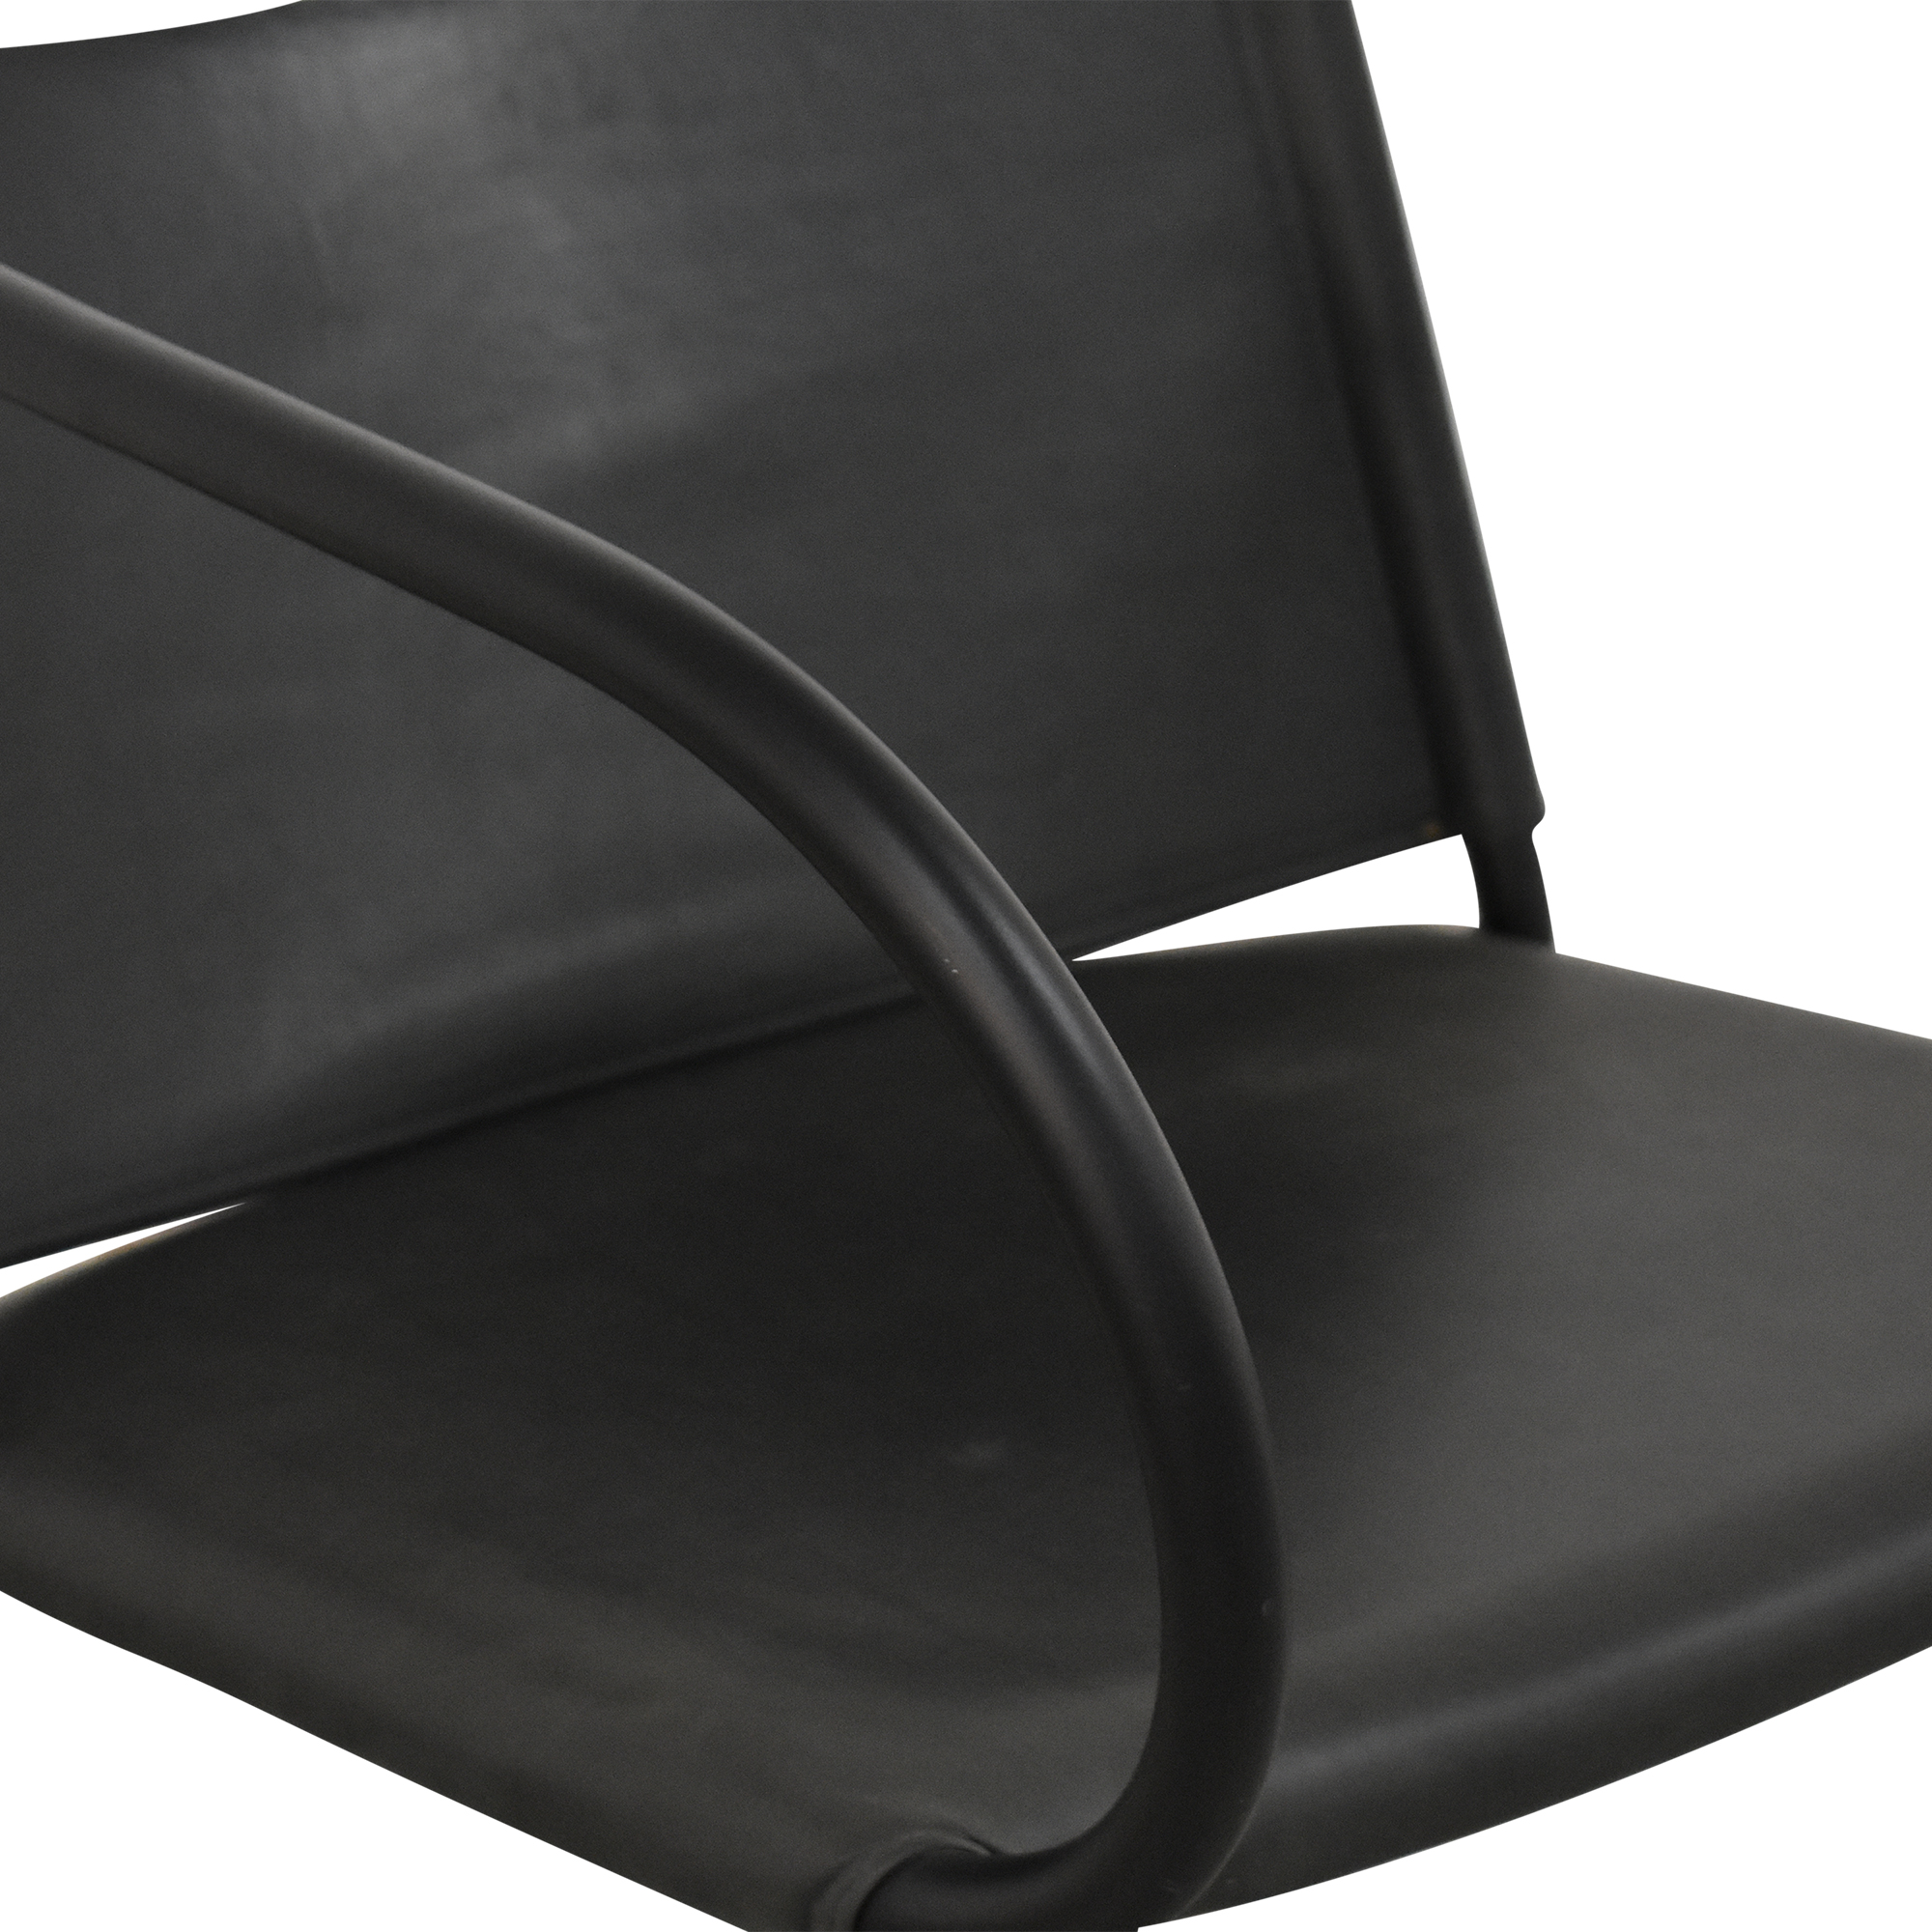 Menu Design Shop Menu Design Shop Afteroom Lounge Chair coupon